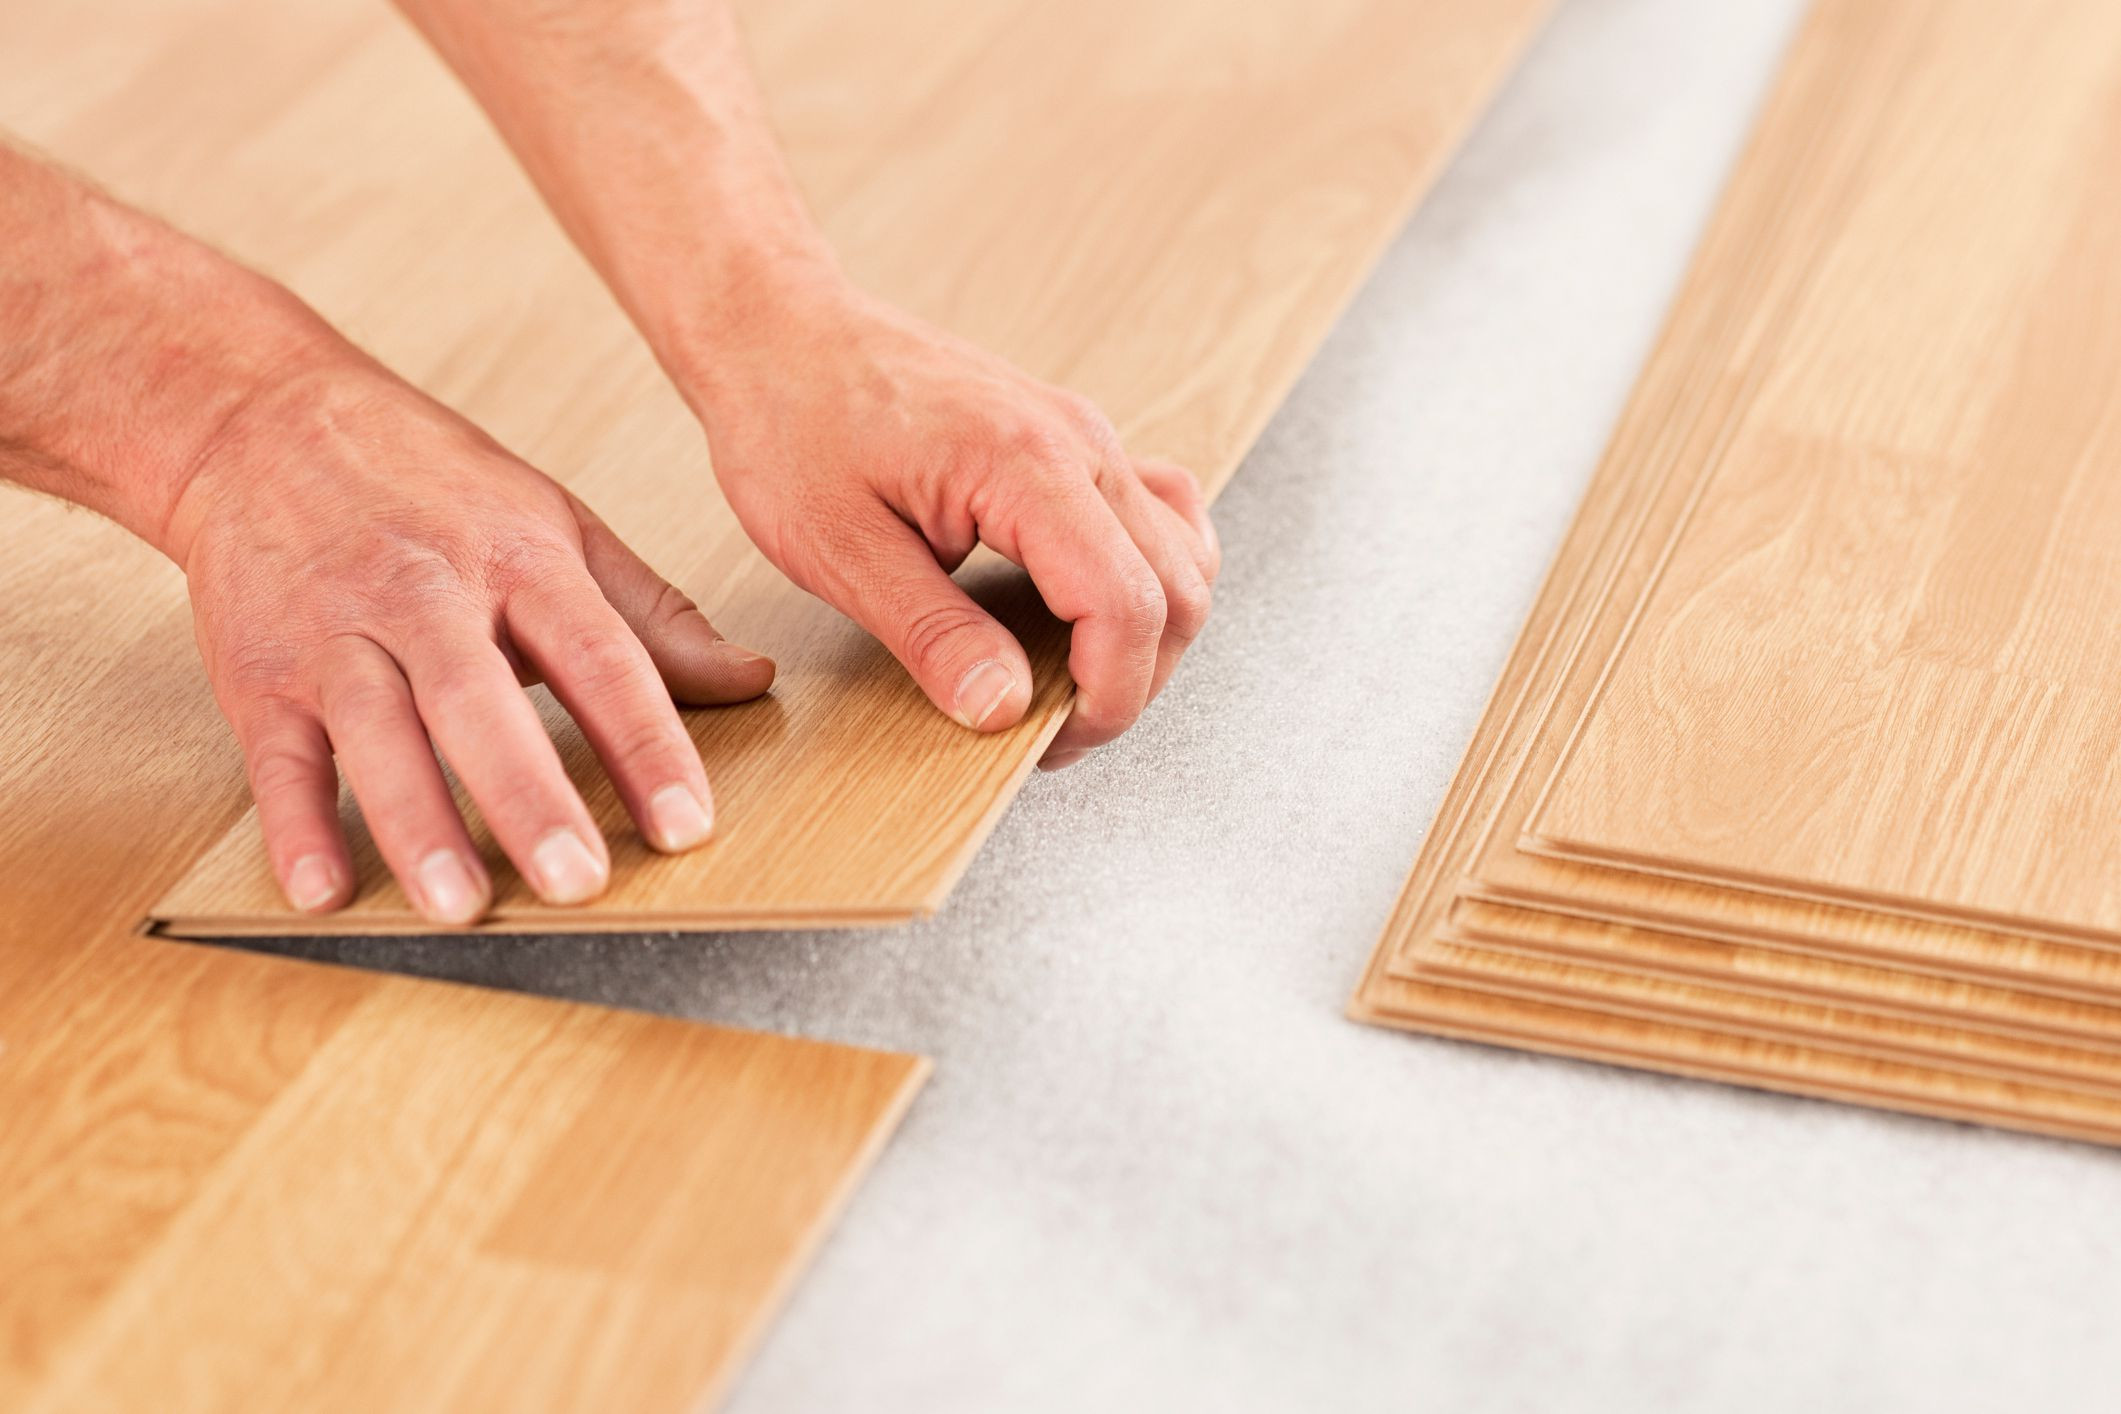 installing engineered hardwood flooring in basement of laminate underlayment pros and cons regarding laminate floor install gettyimages 154961561 588816495f9b58bdb3da1a02